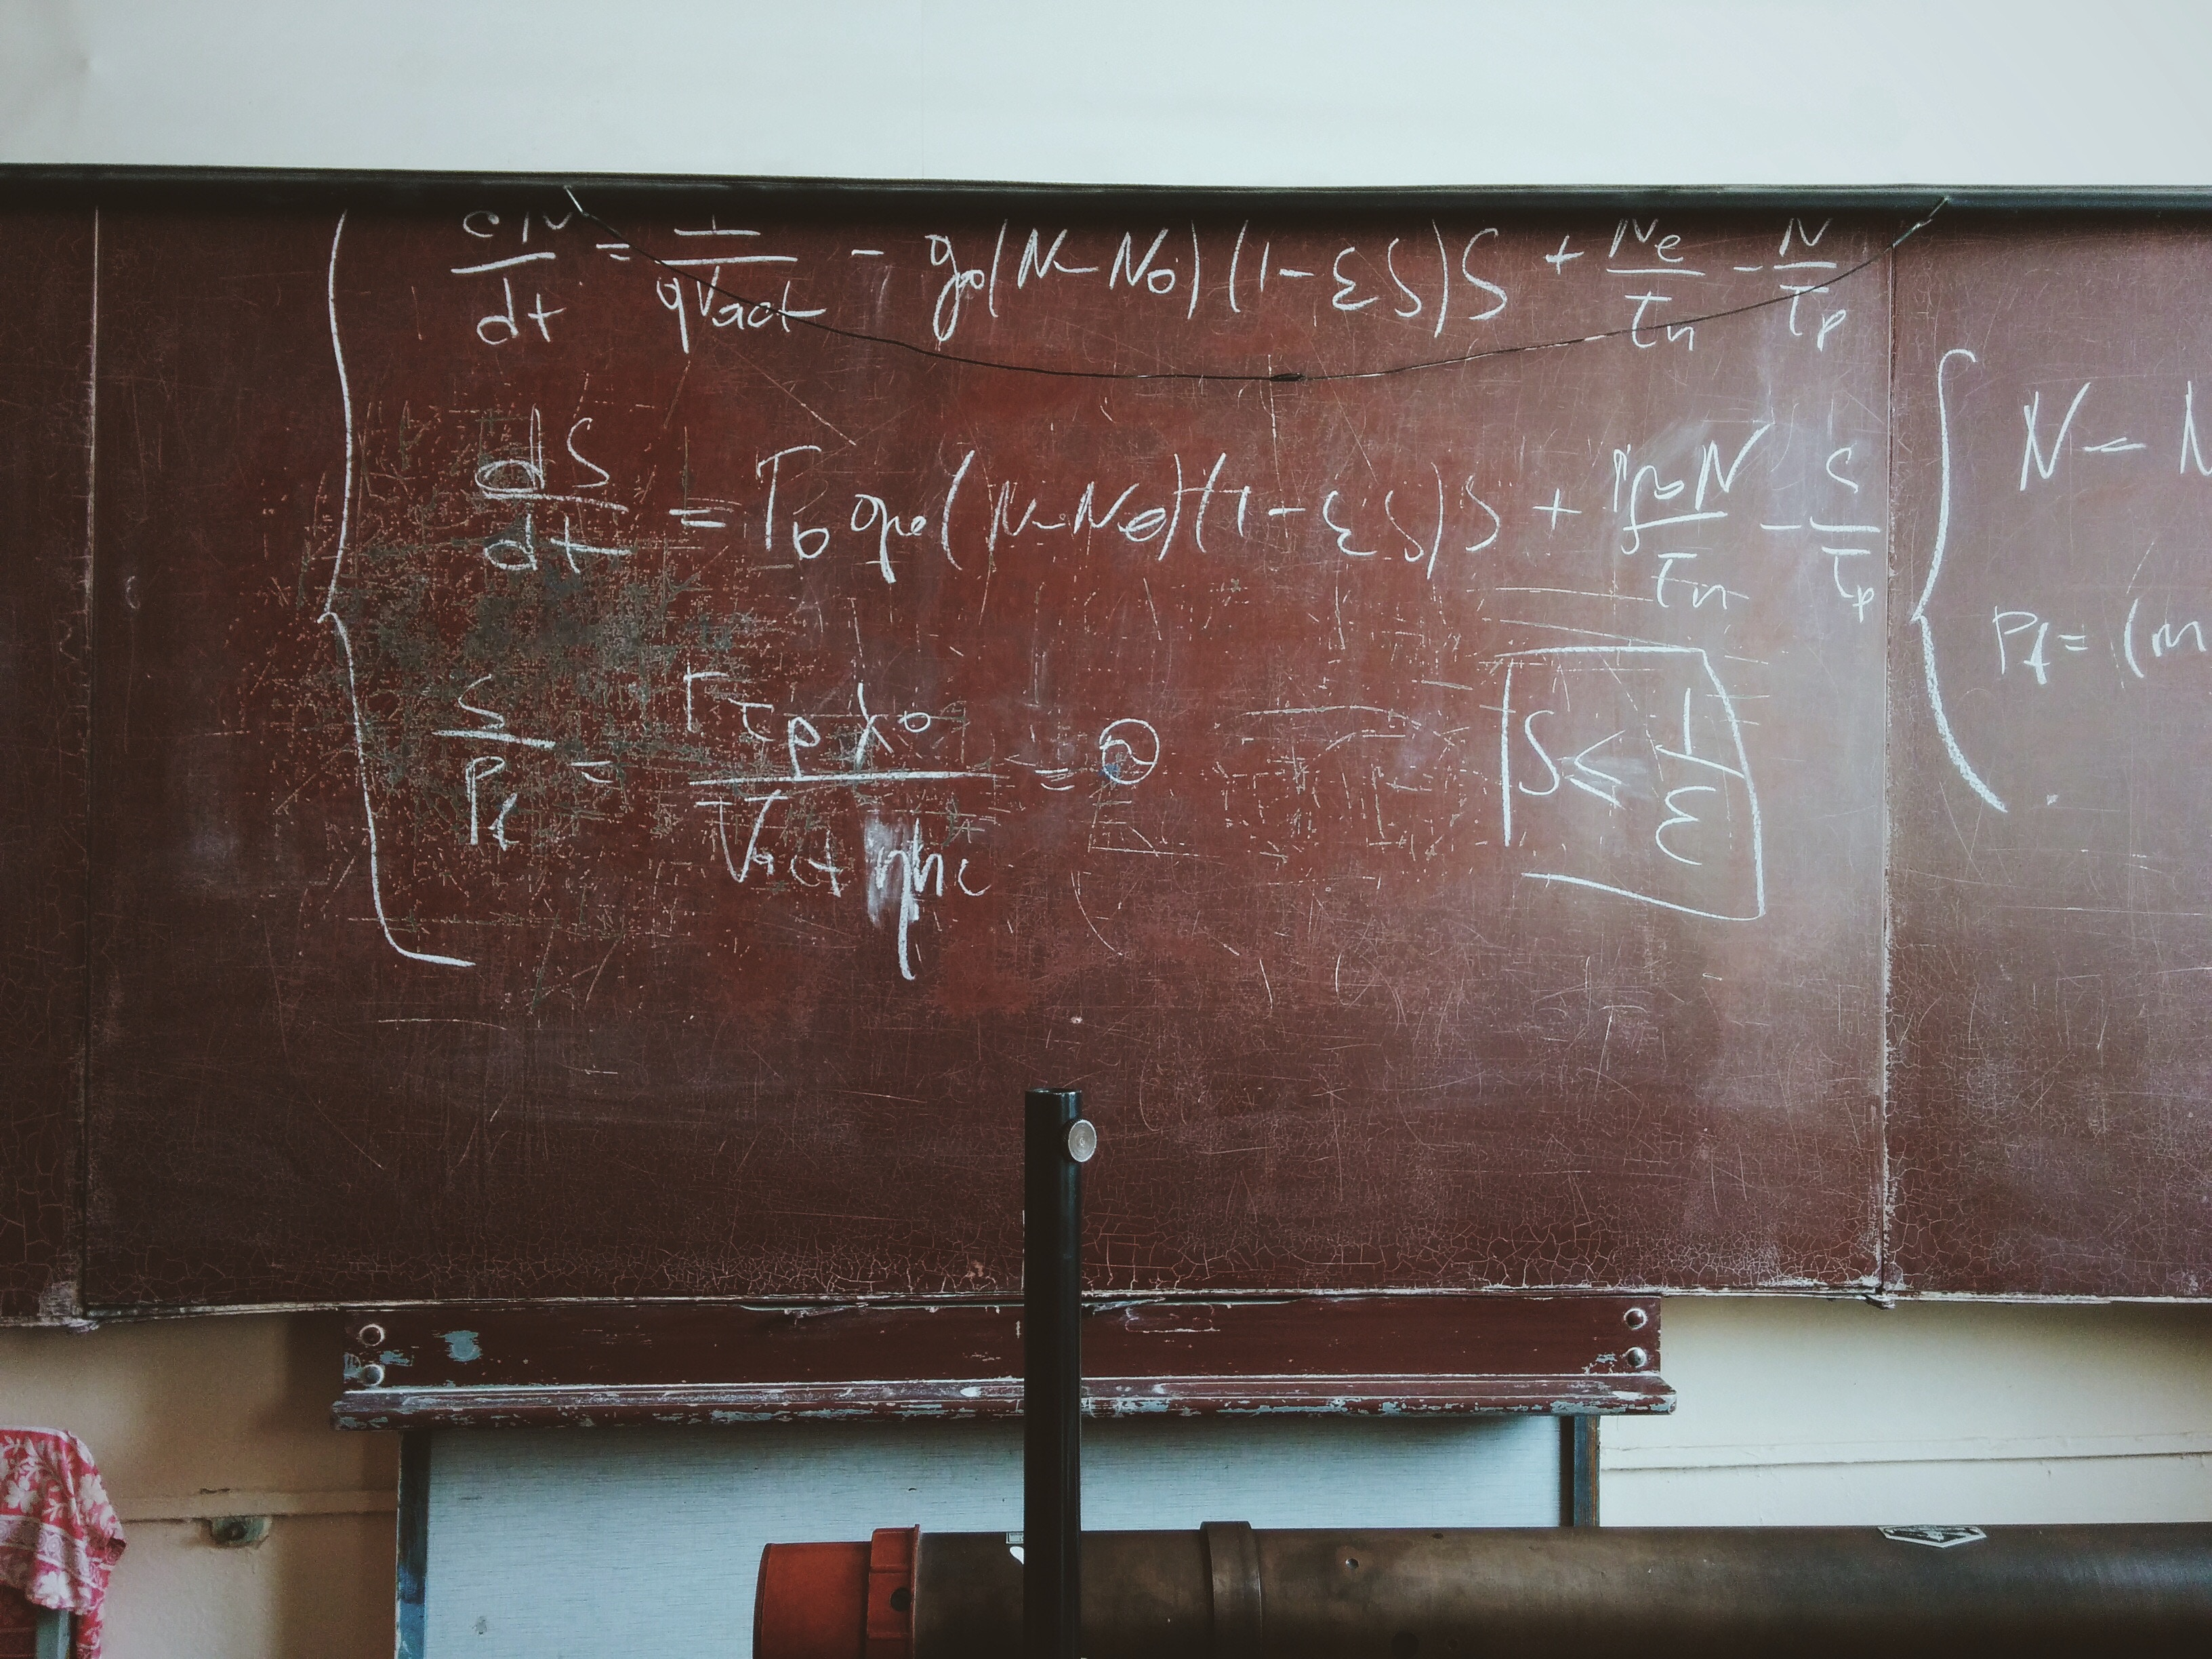 Technische Universität München: как я поступила в магистратуру